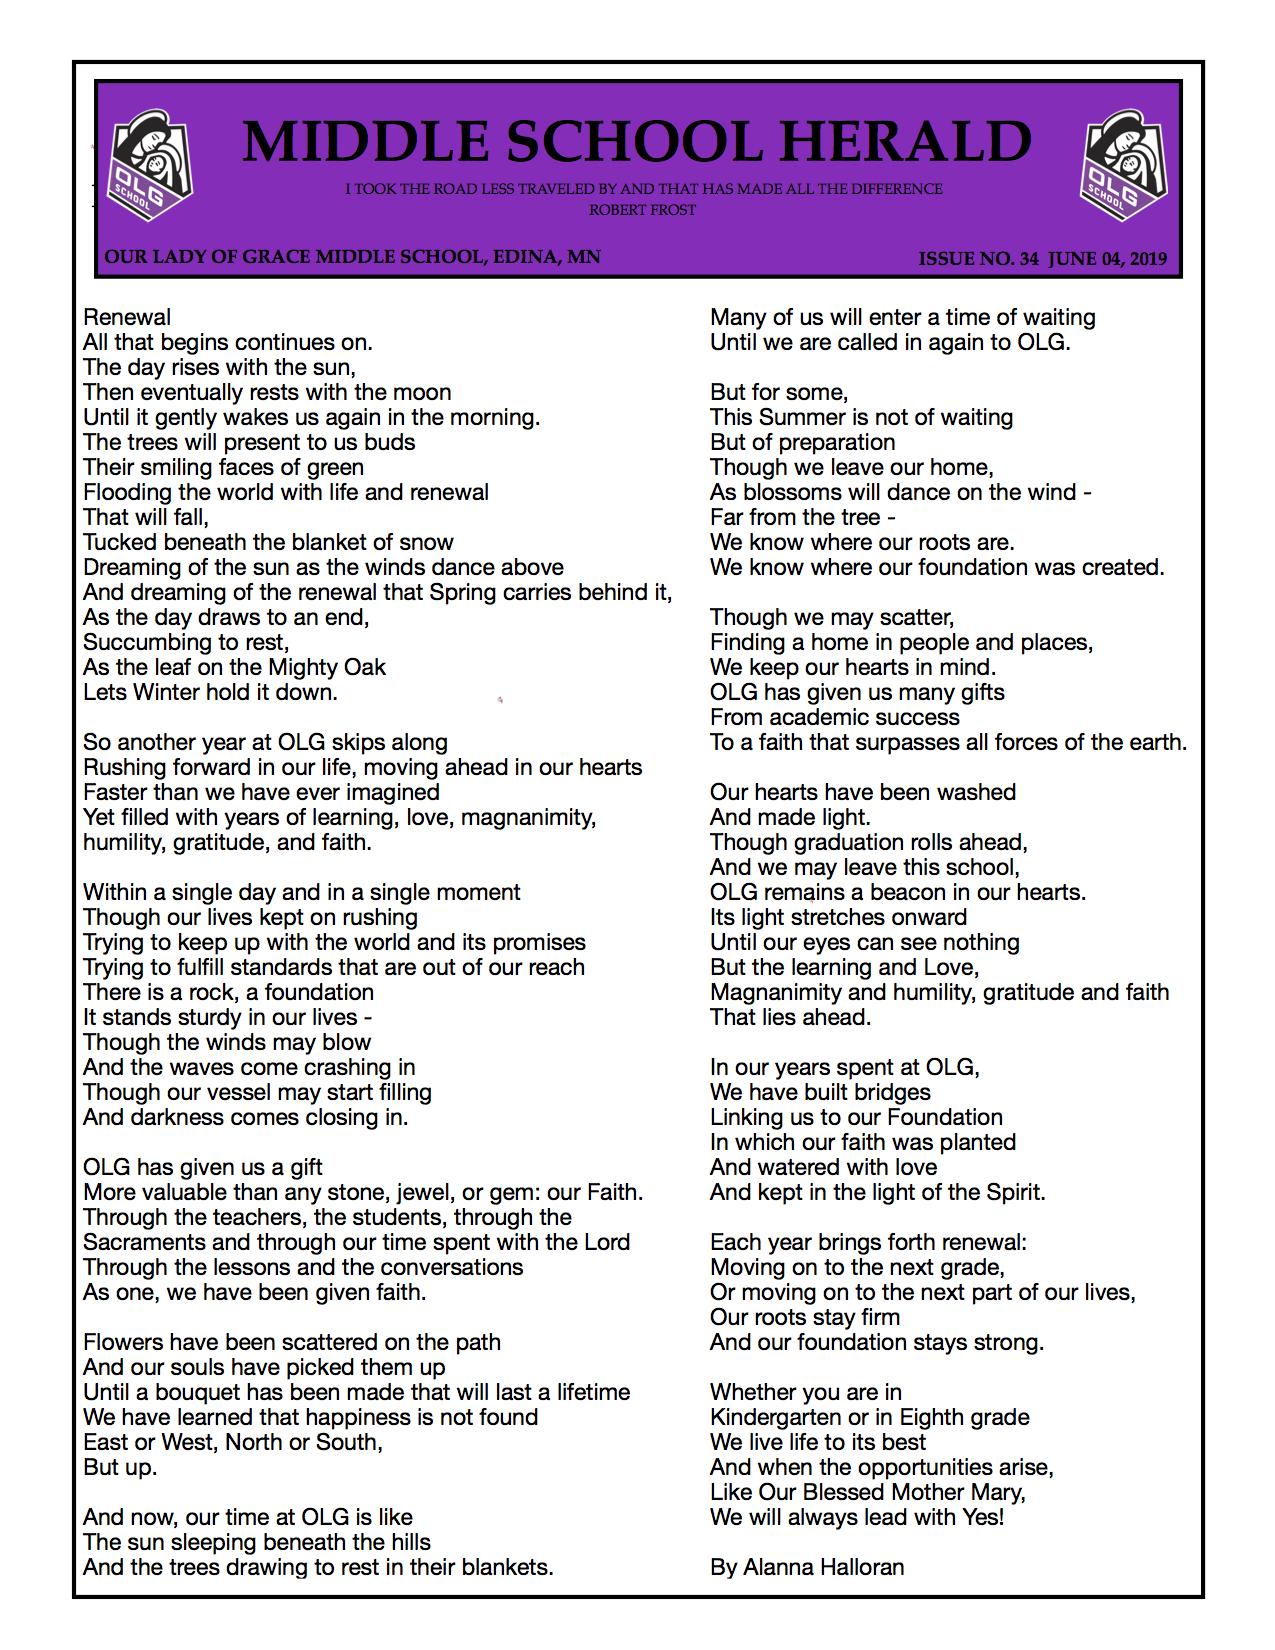 MS Herald 06.04.19 pt. 2 - Poem.jpg